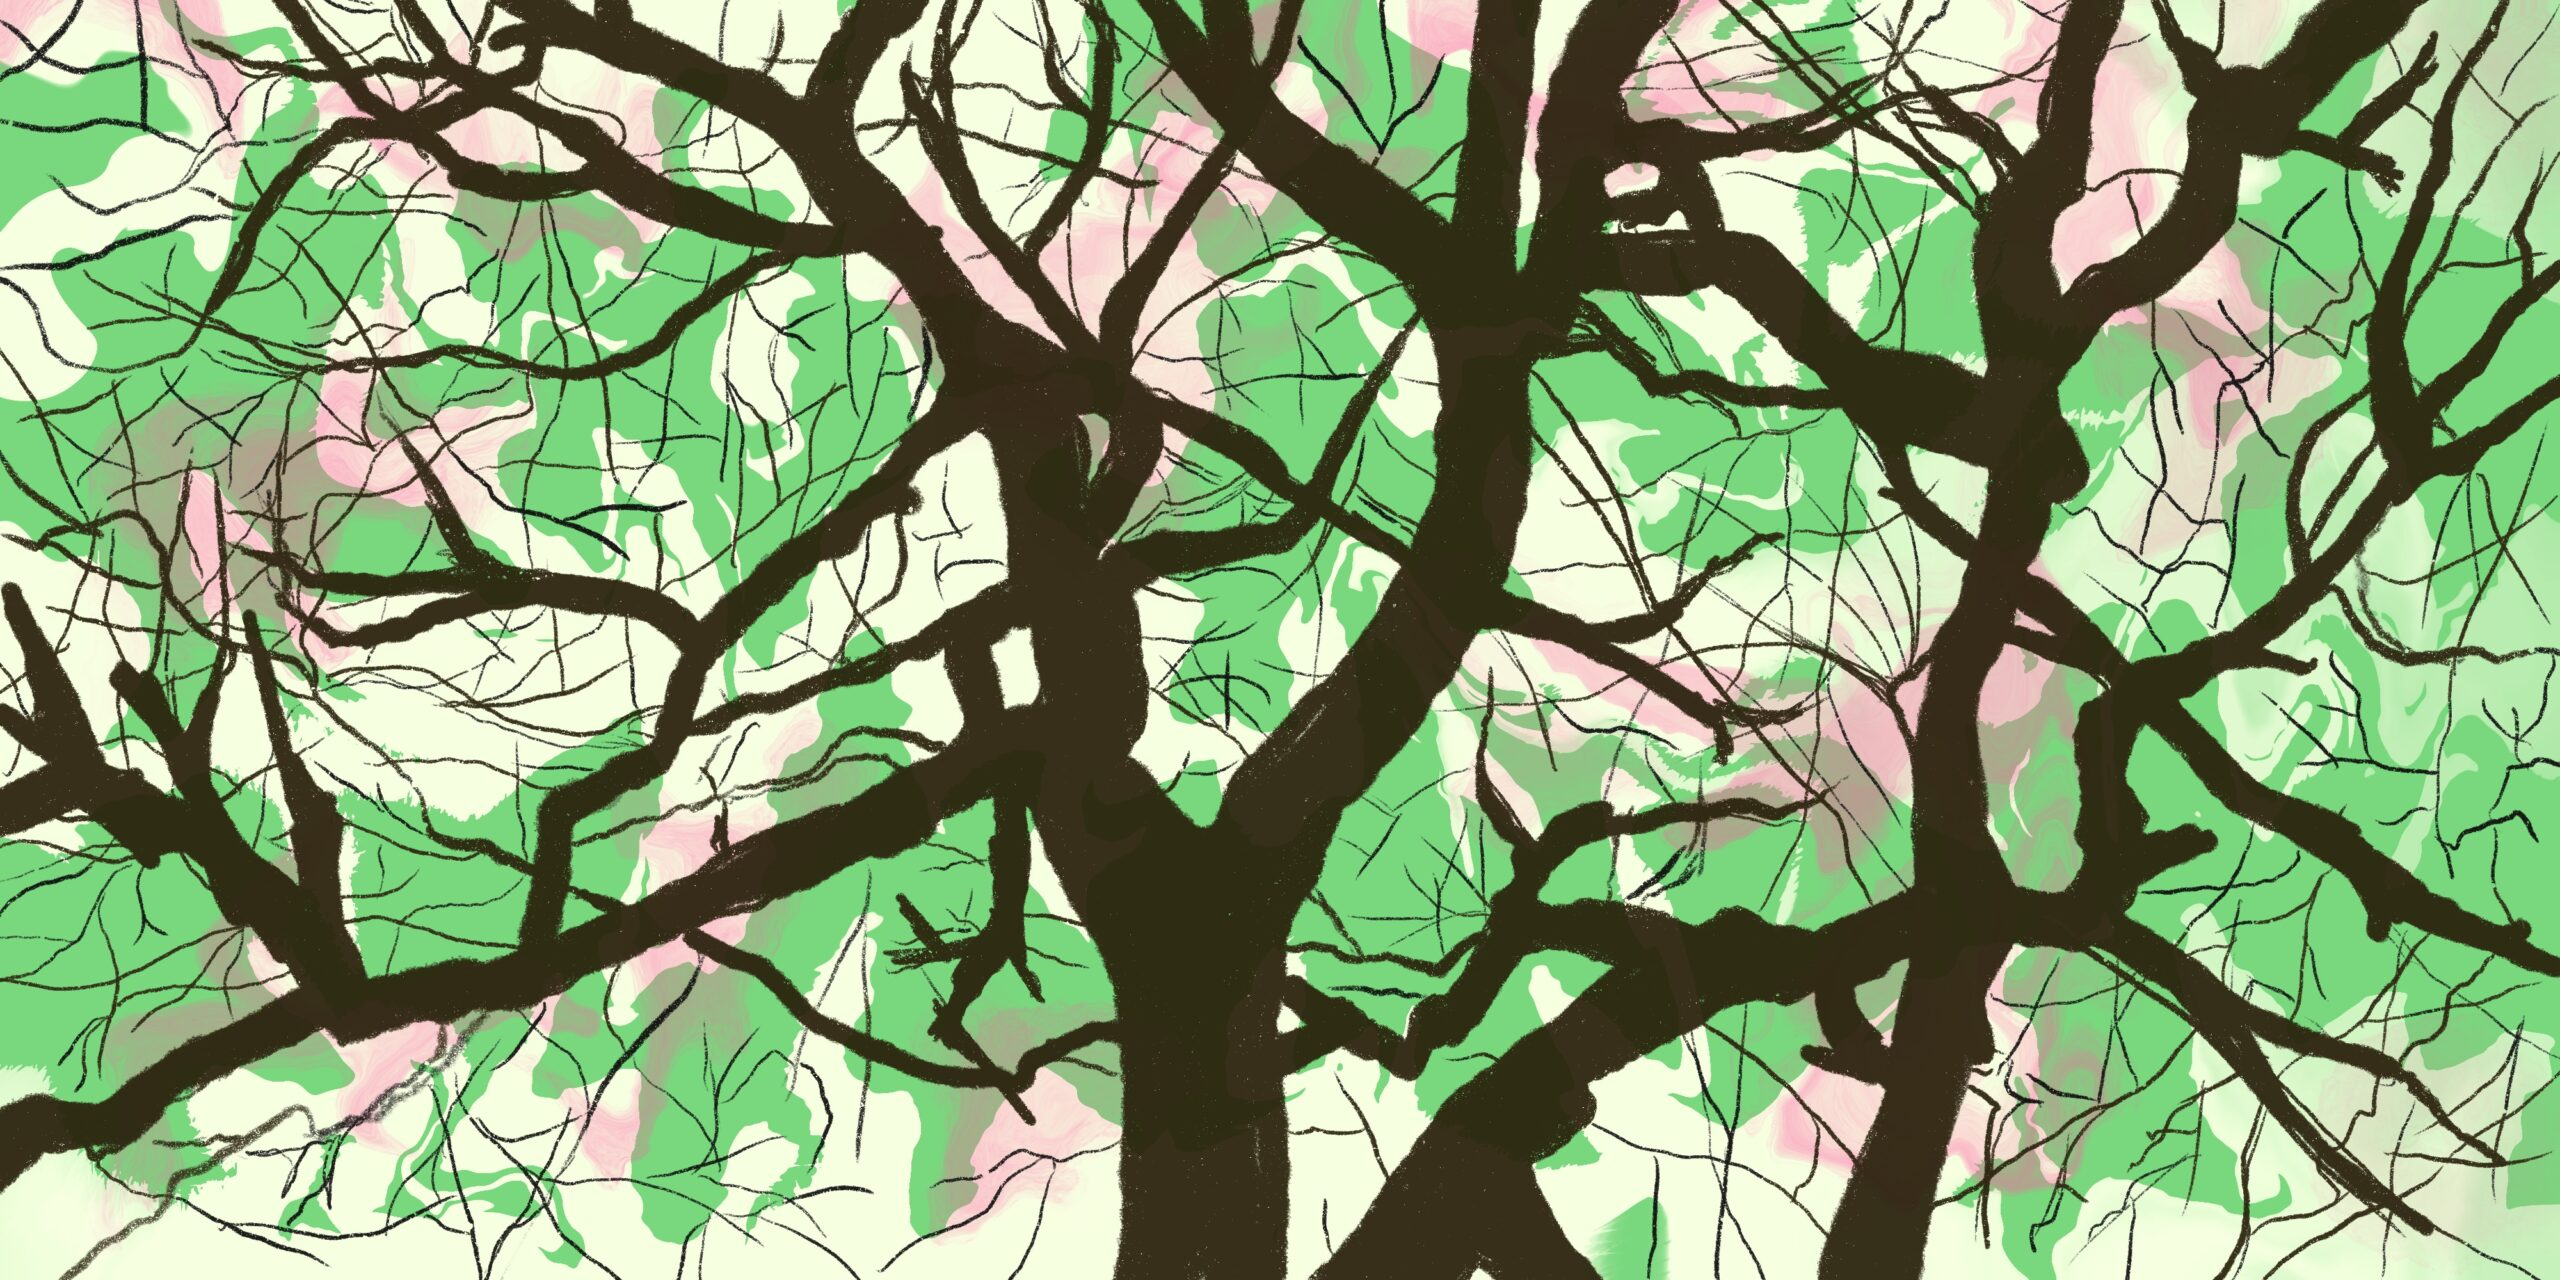 Full color tree illustration.